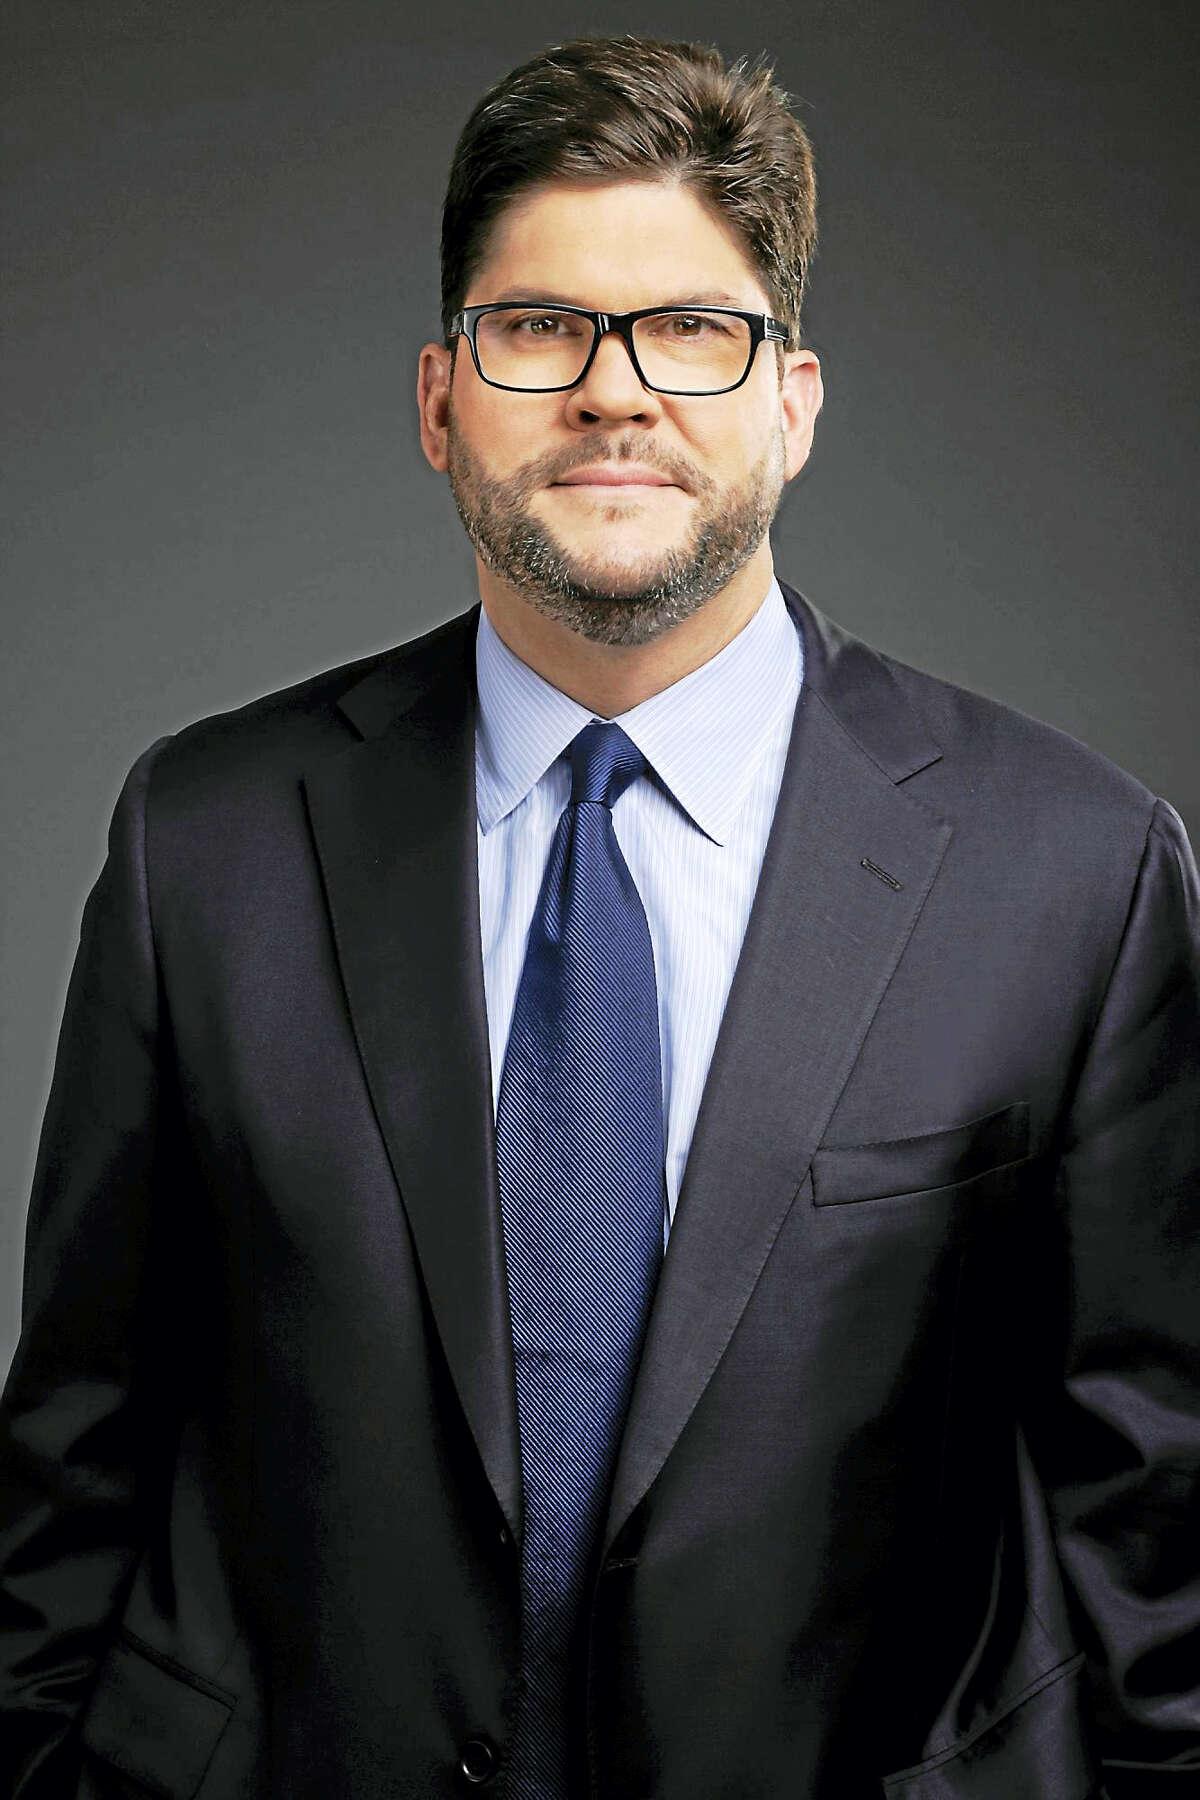 Branford-raised Jim Bell, executive producer of NBC Olympics.